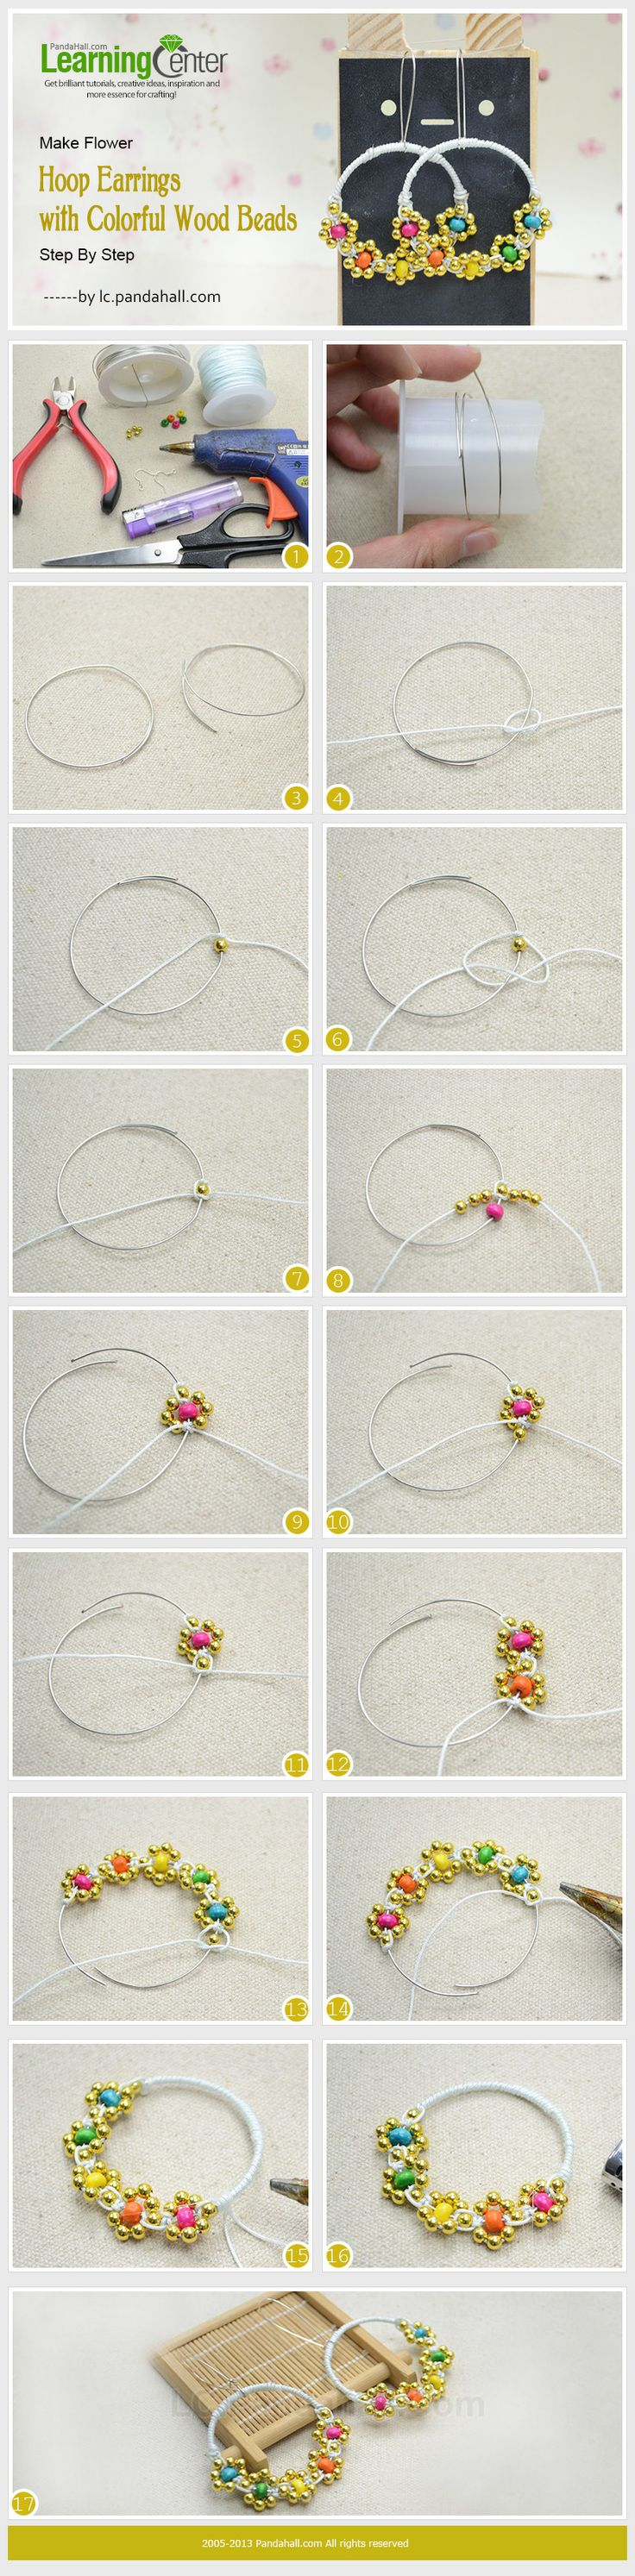 Make Flower Hoop Earrings with Colorful Wood Beads Step By Step